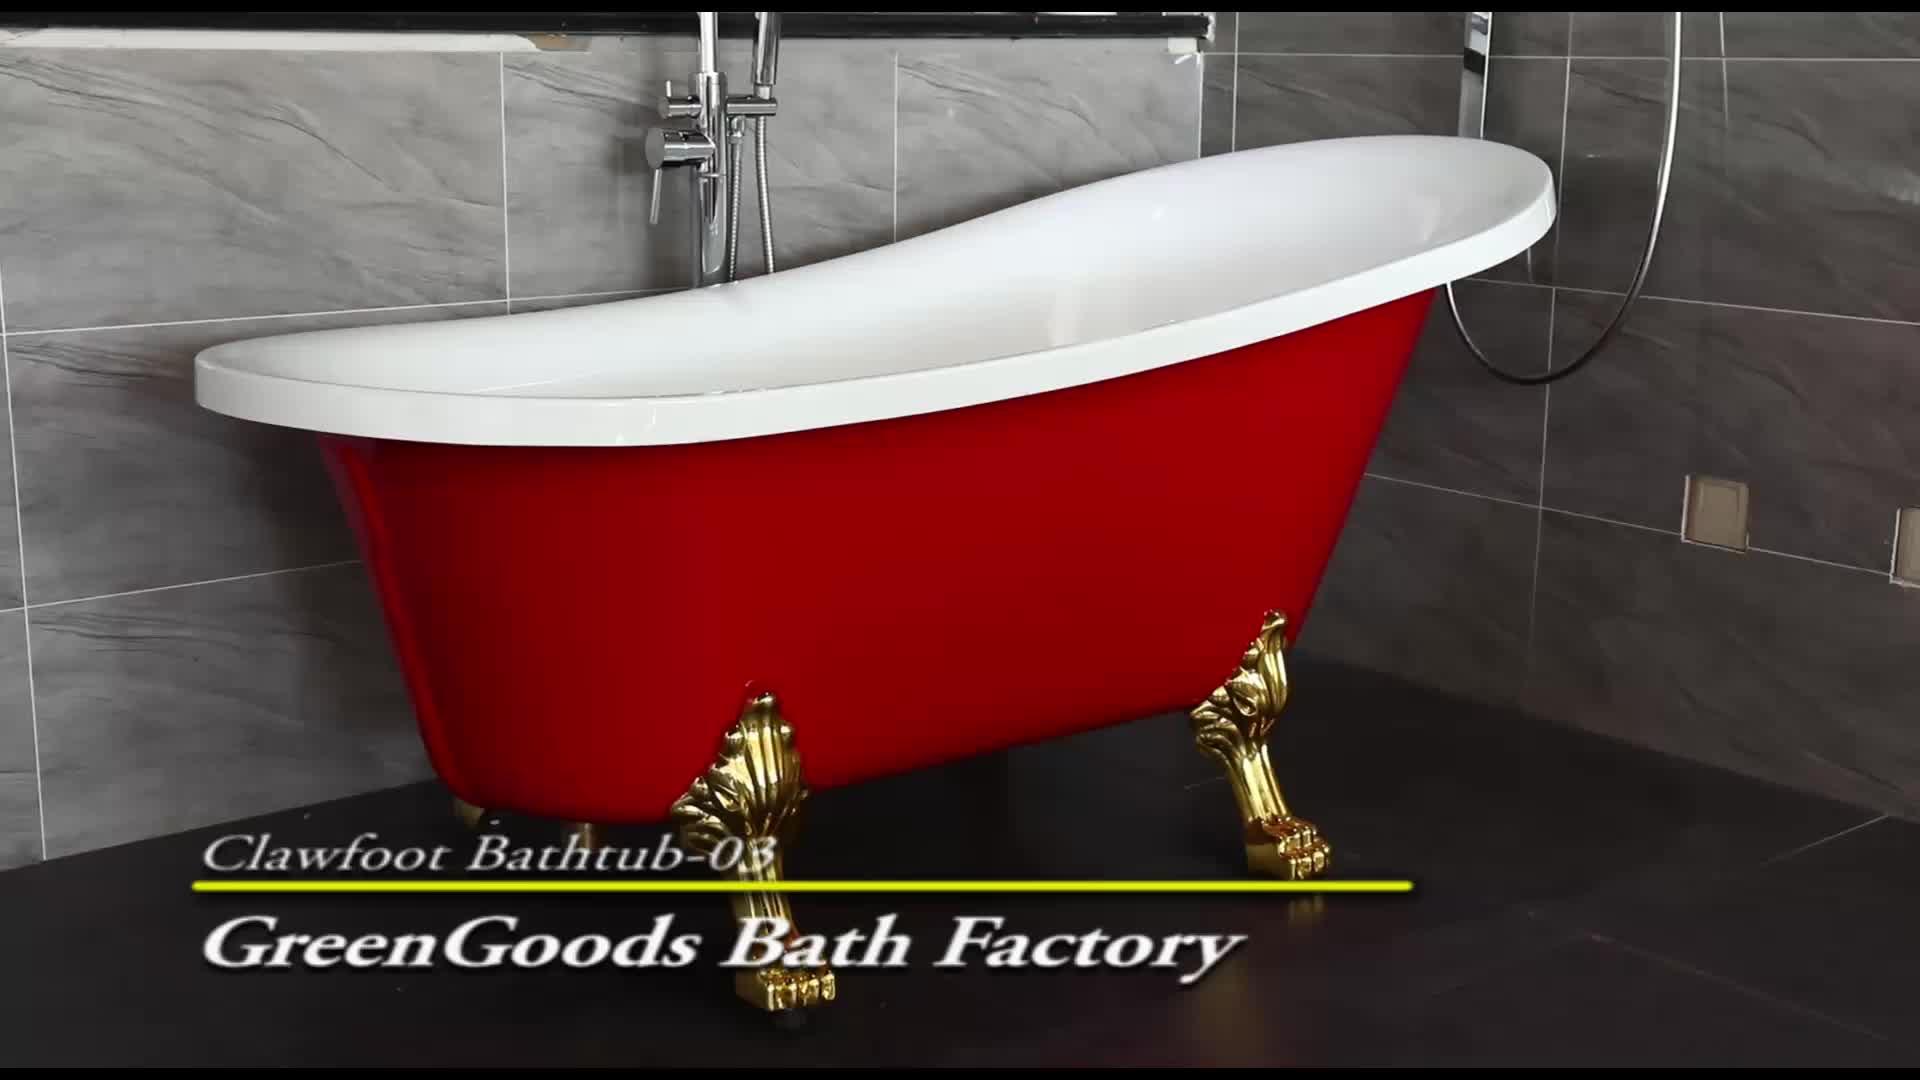 GreenGoods Bath Factory Japan Red Beverage Antique Tub